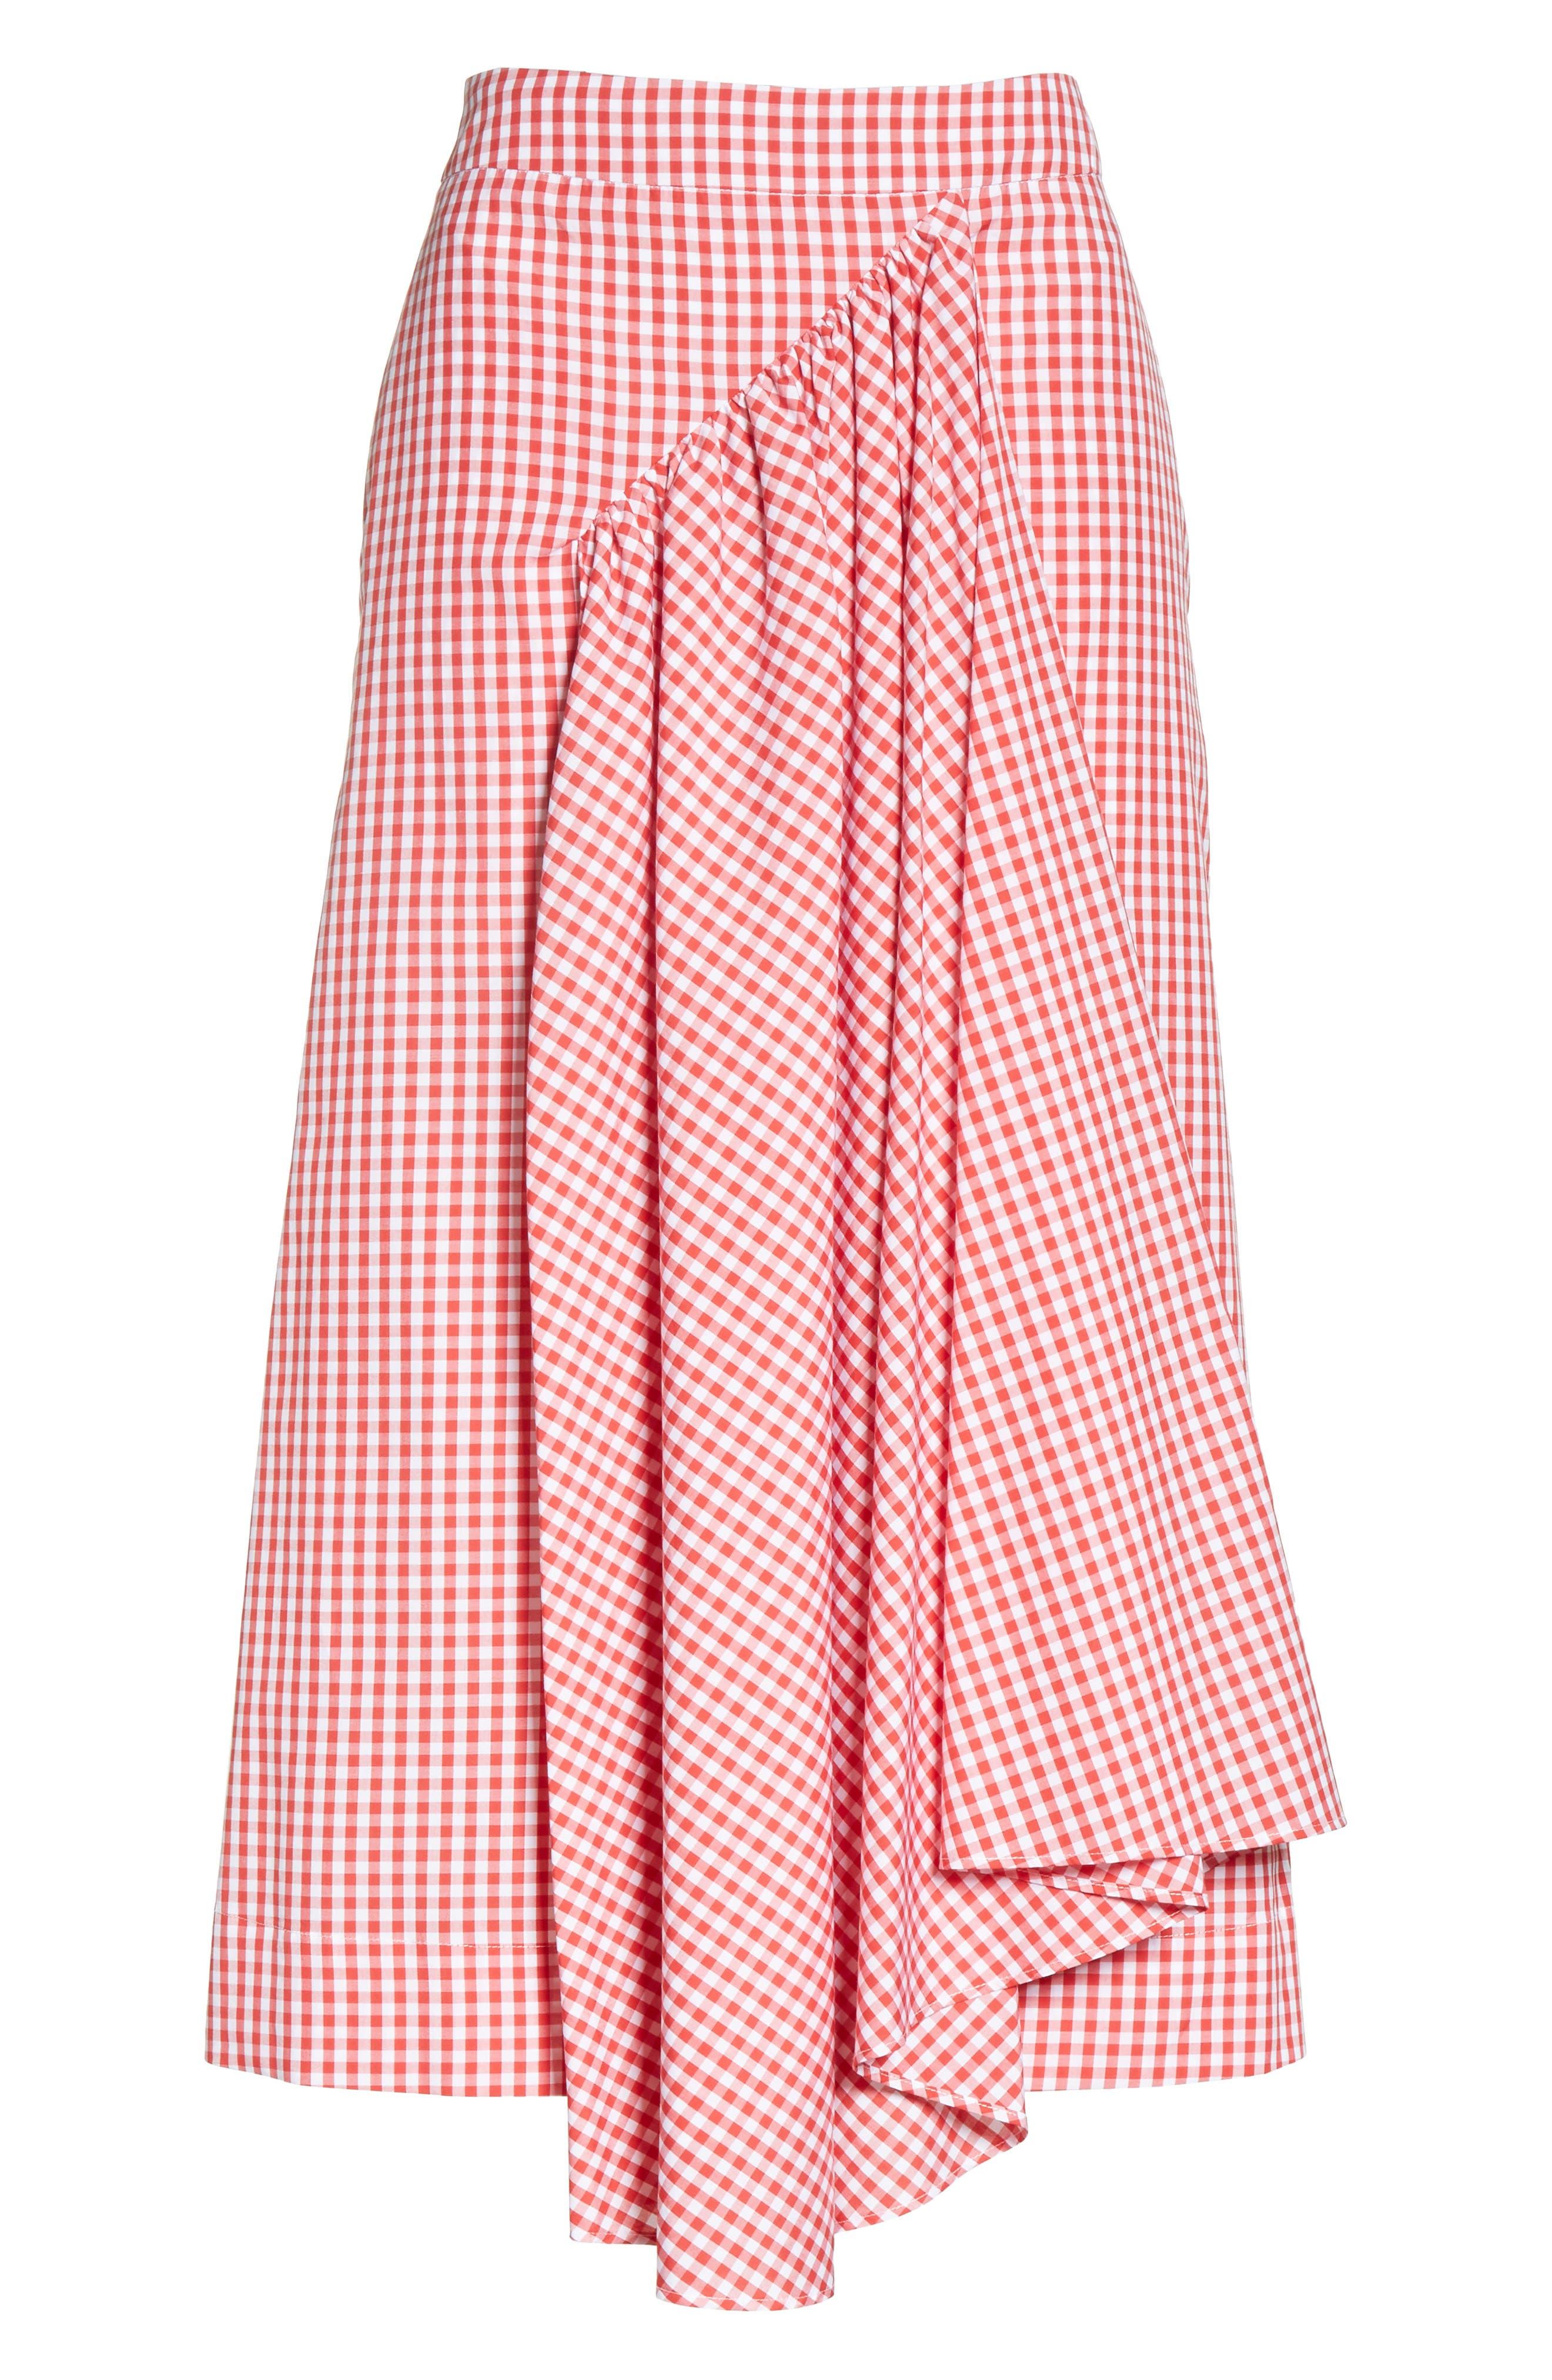 Three-Panel Gingham Midi Skirt,                         Main,                         color, Red/ White